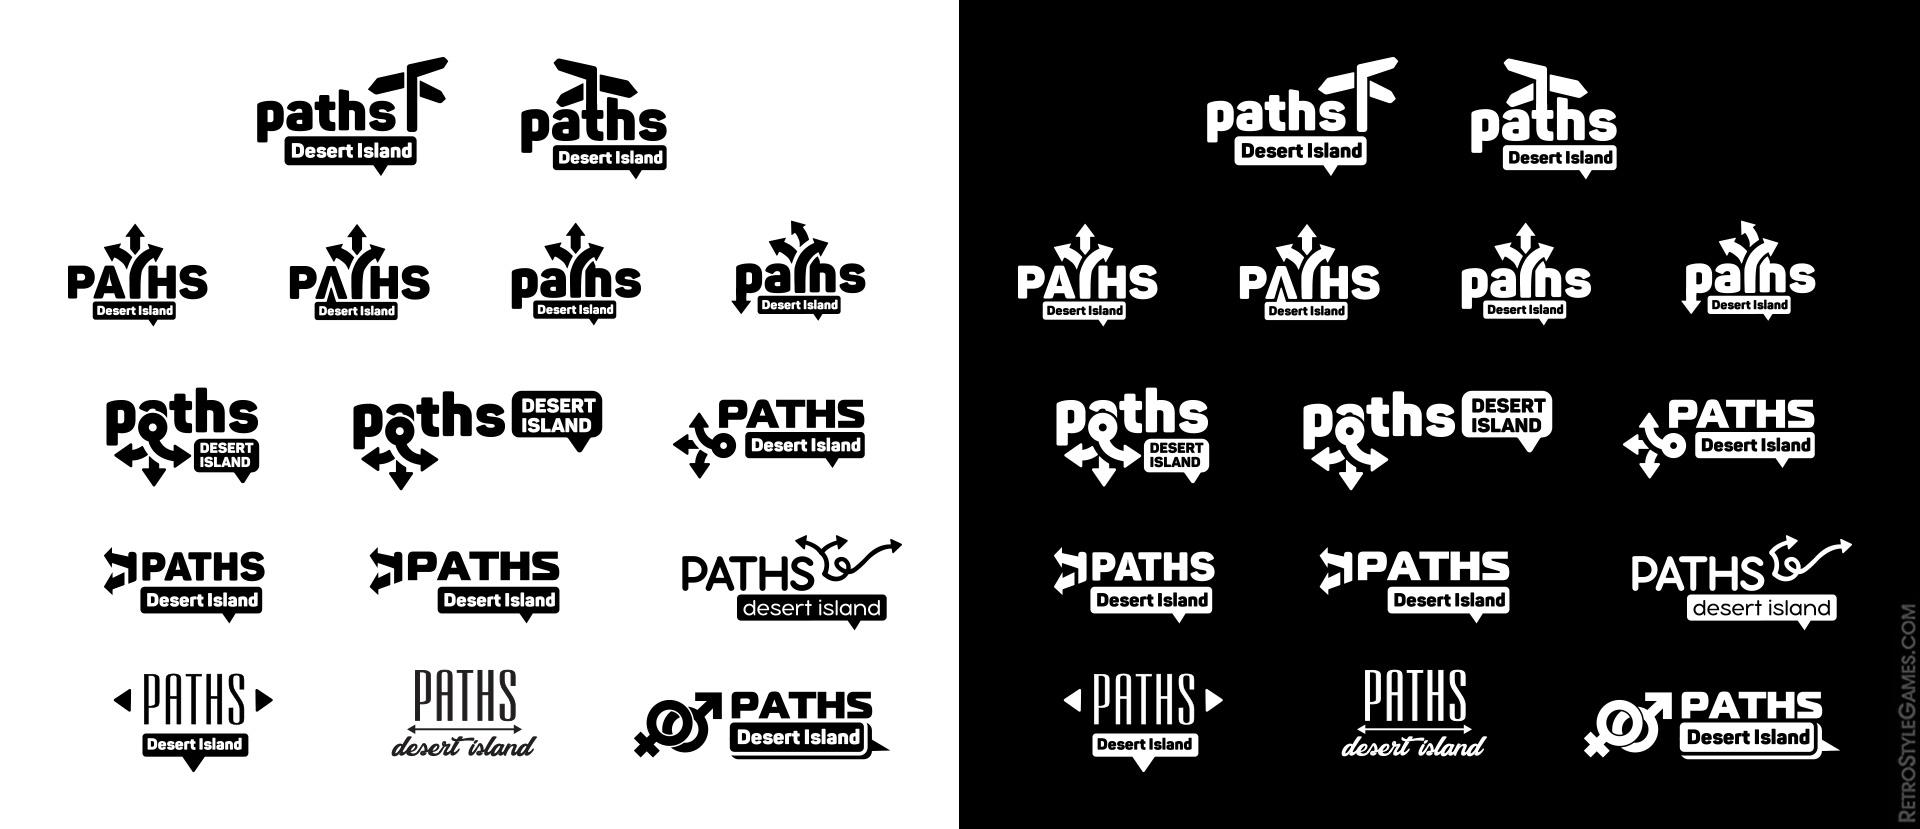 Paths Desert Island 2D Game Logo Vector Illustration